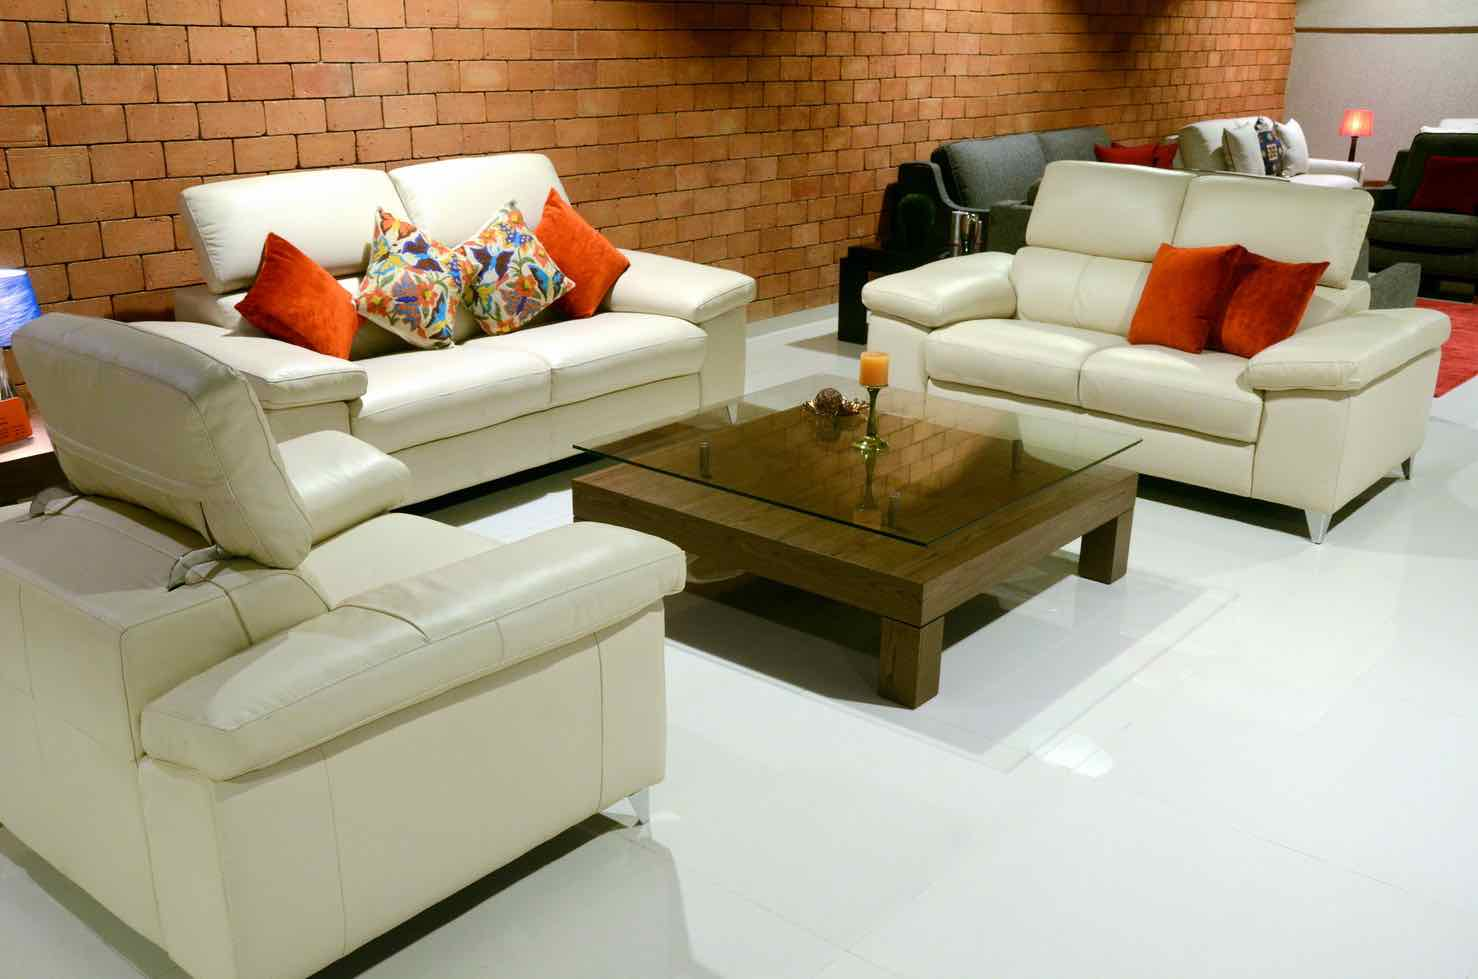 Bolivia Sofa range